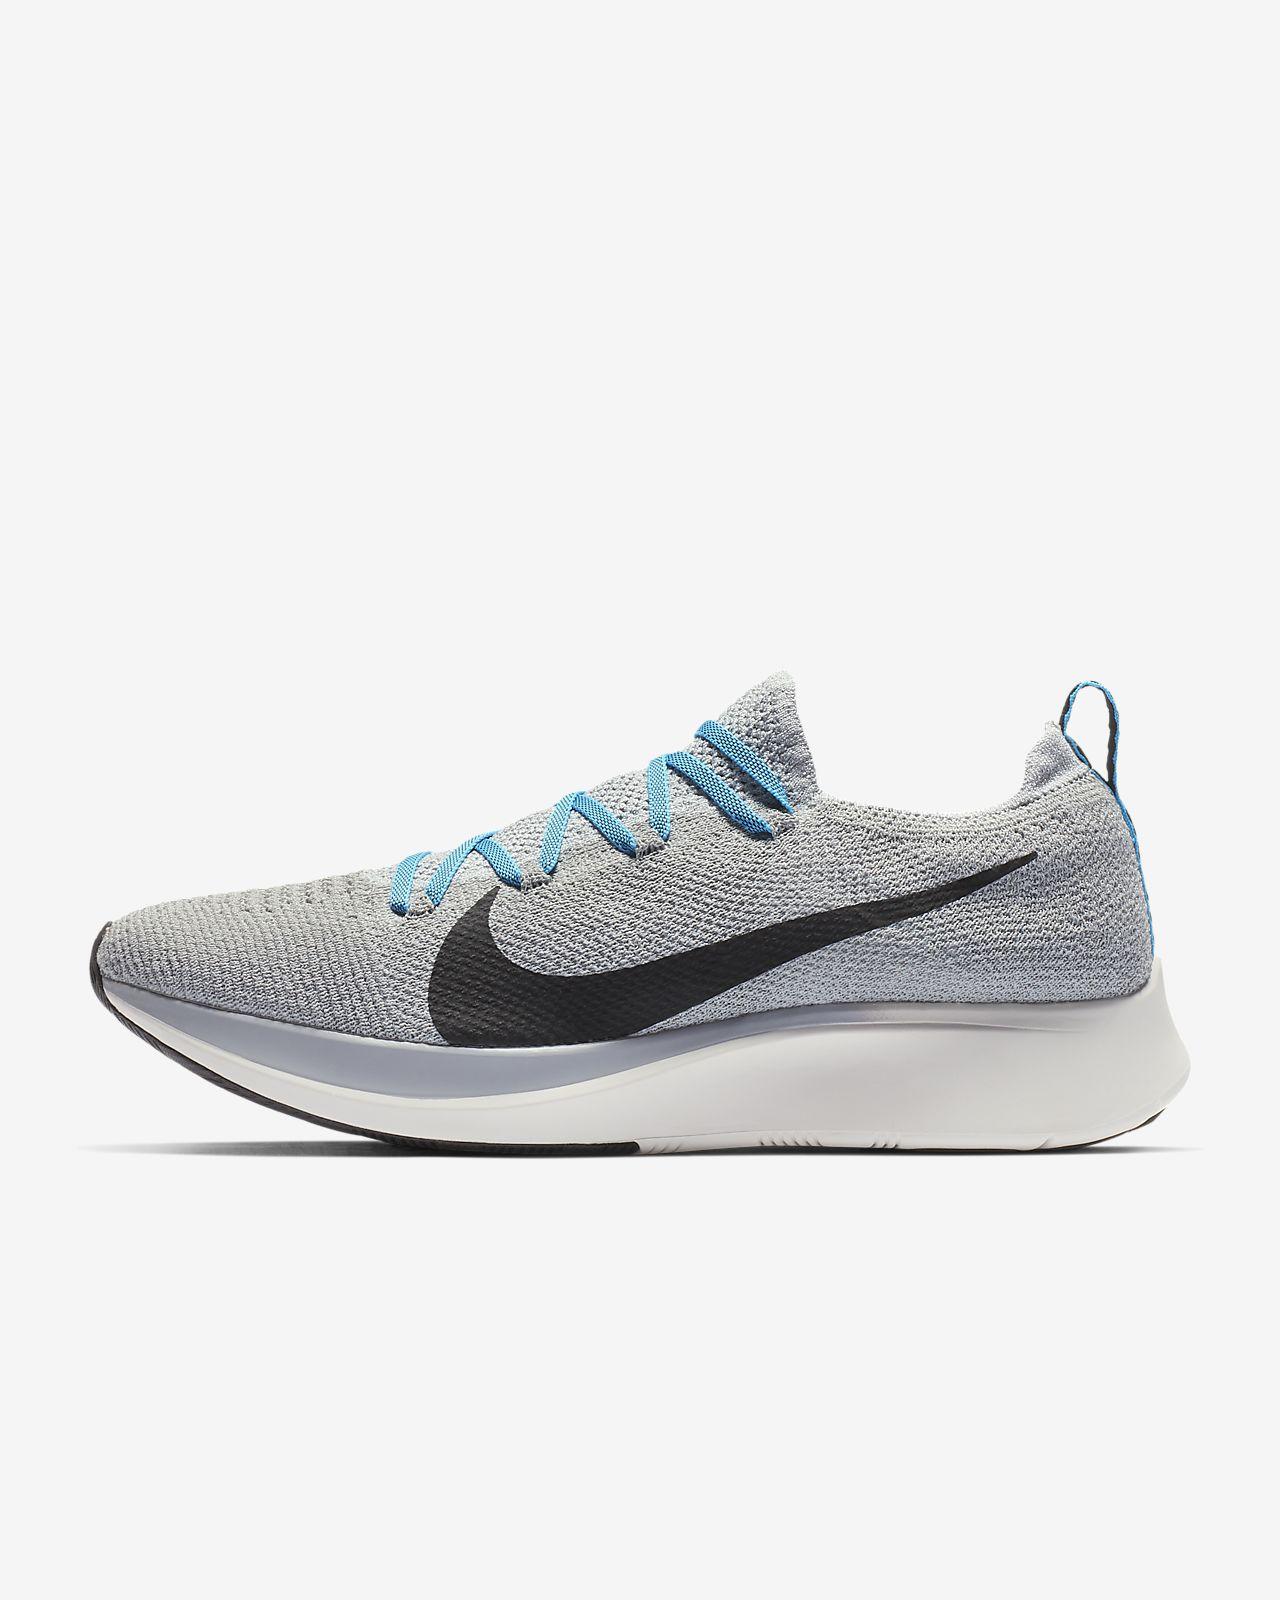 Nike Zoom Fly Flyknit Zapatillas de running - Hombre. Nike.com ES 647d0102d480b